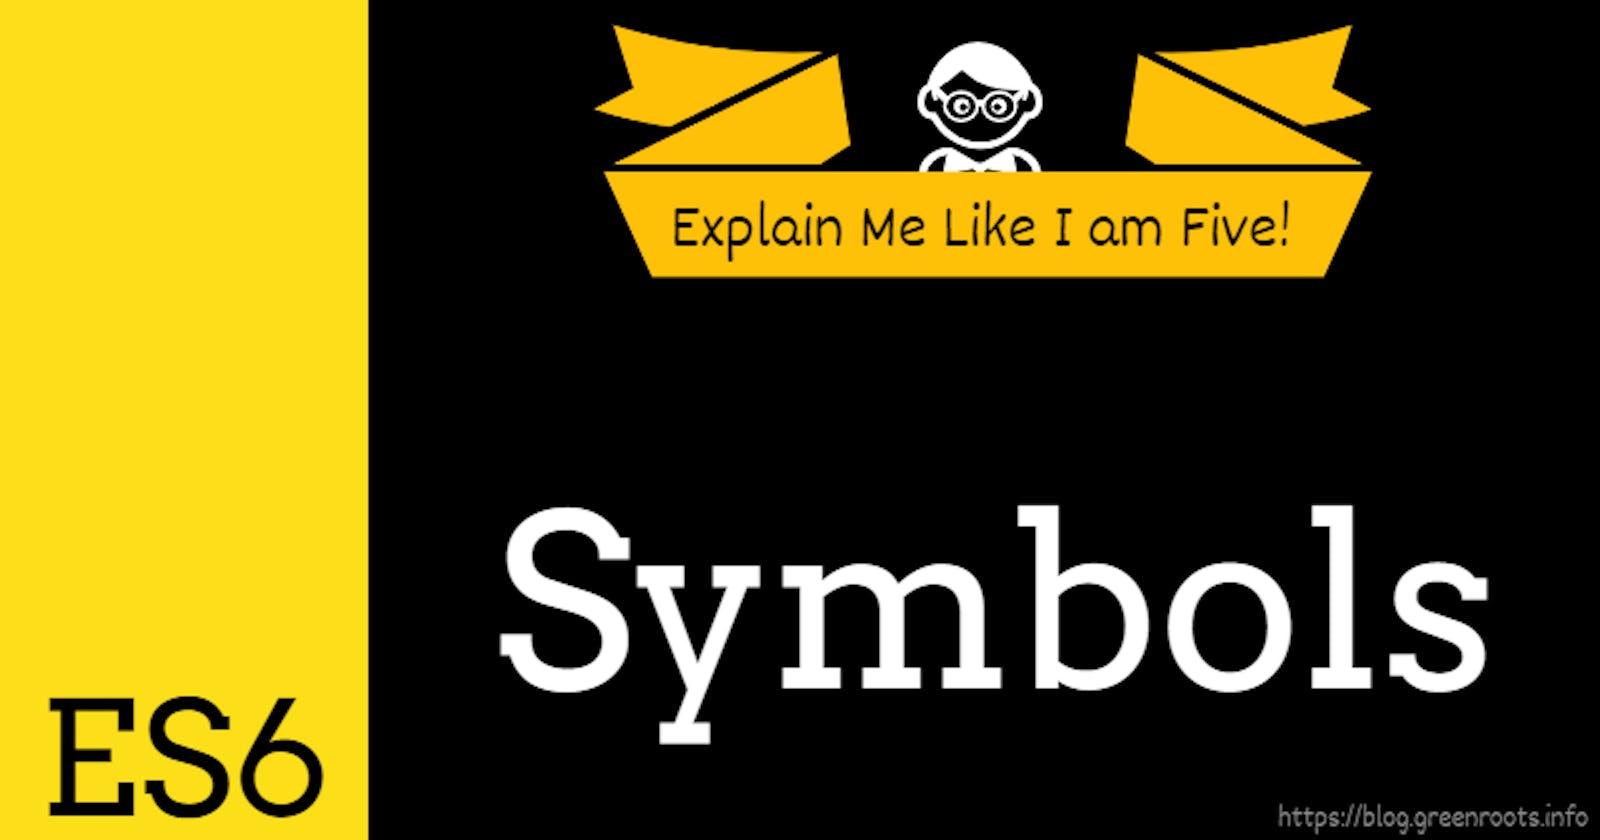 Explain Me Like I am Five: What are ES6 Symbols?